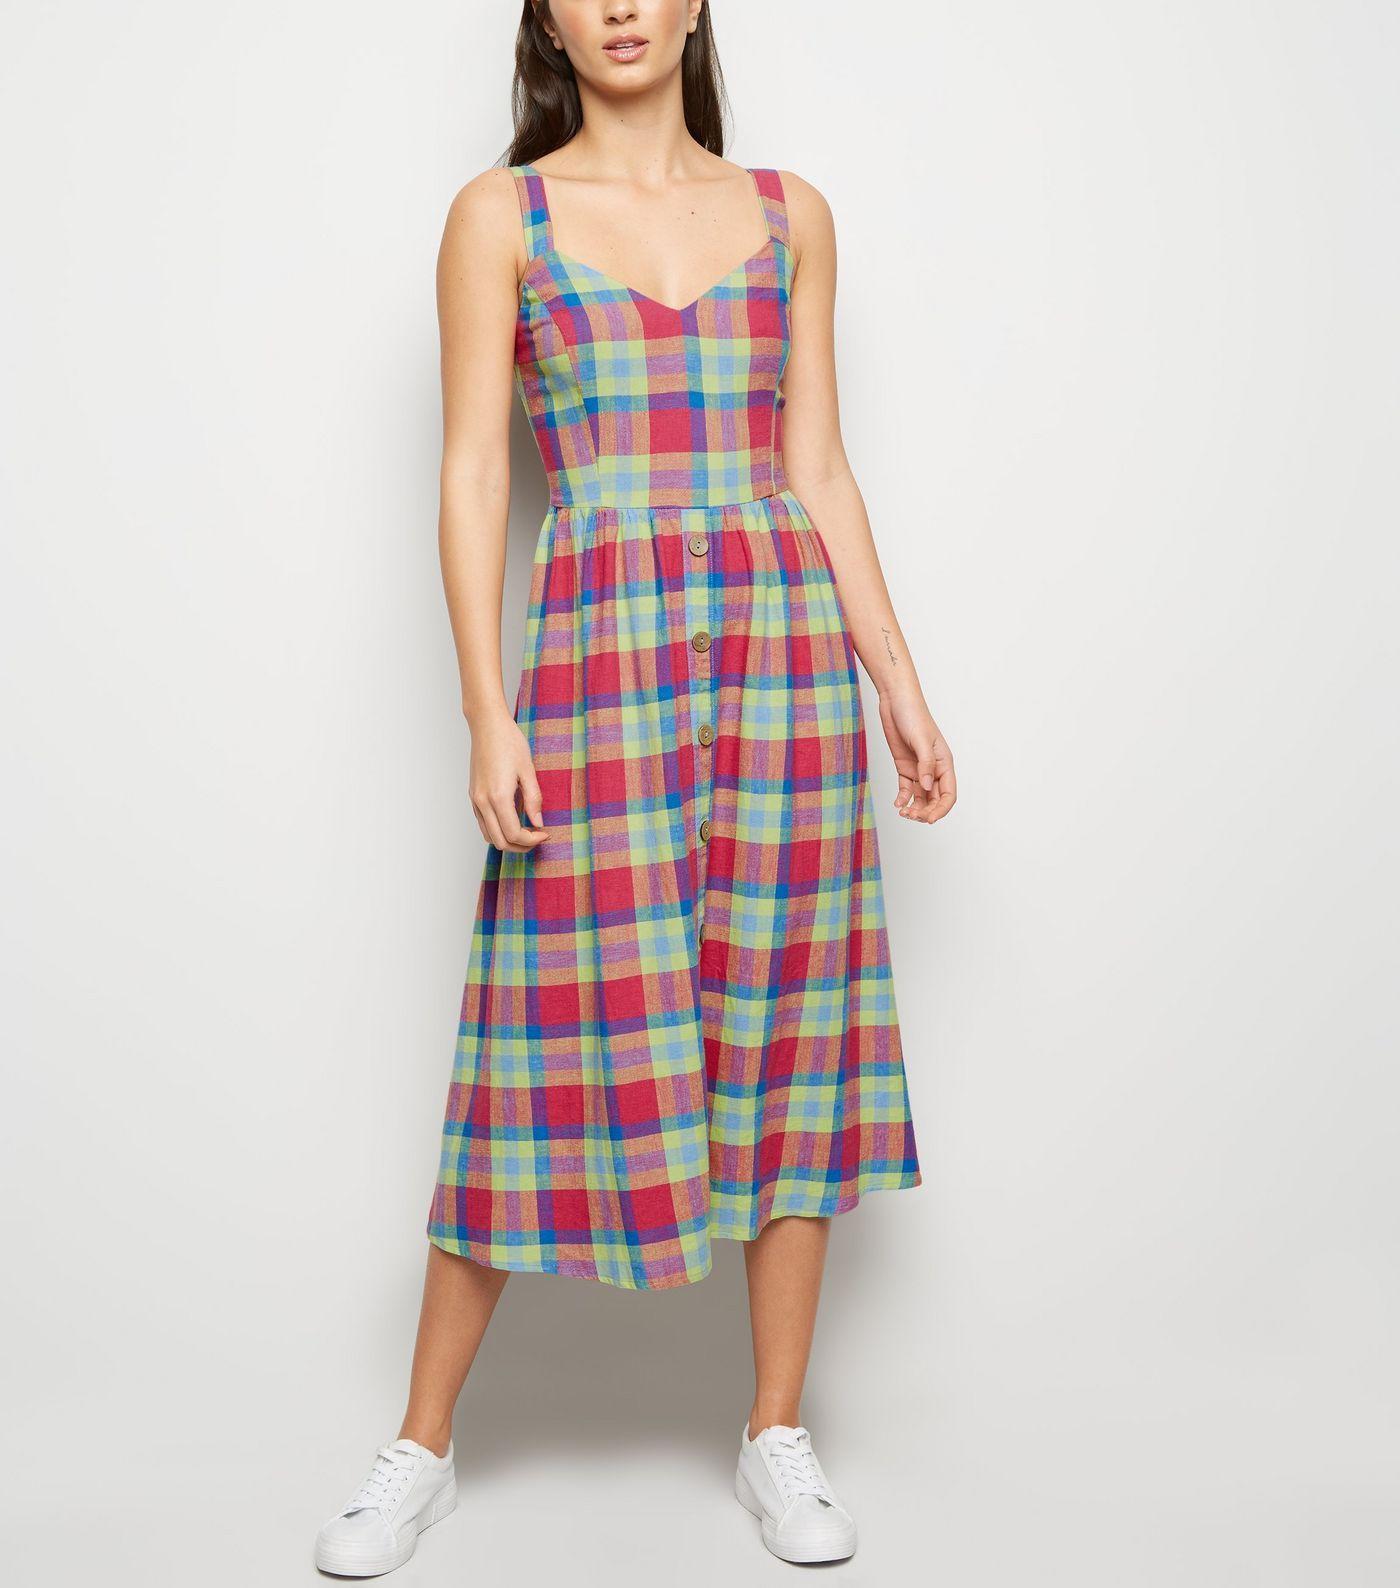 60fce775cd5d4 Multicoloured Check Linen Blend Midi Dress in 2019 | what to wear ...